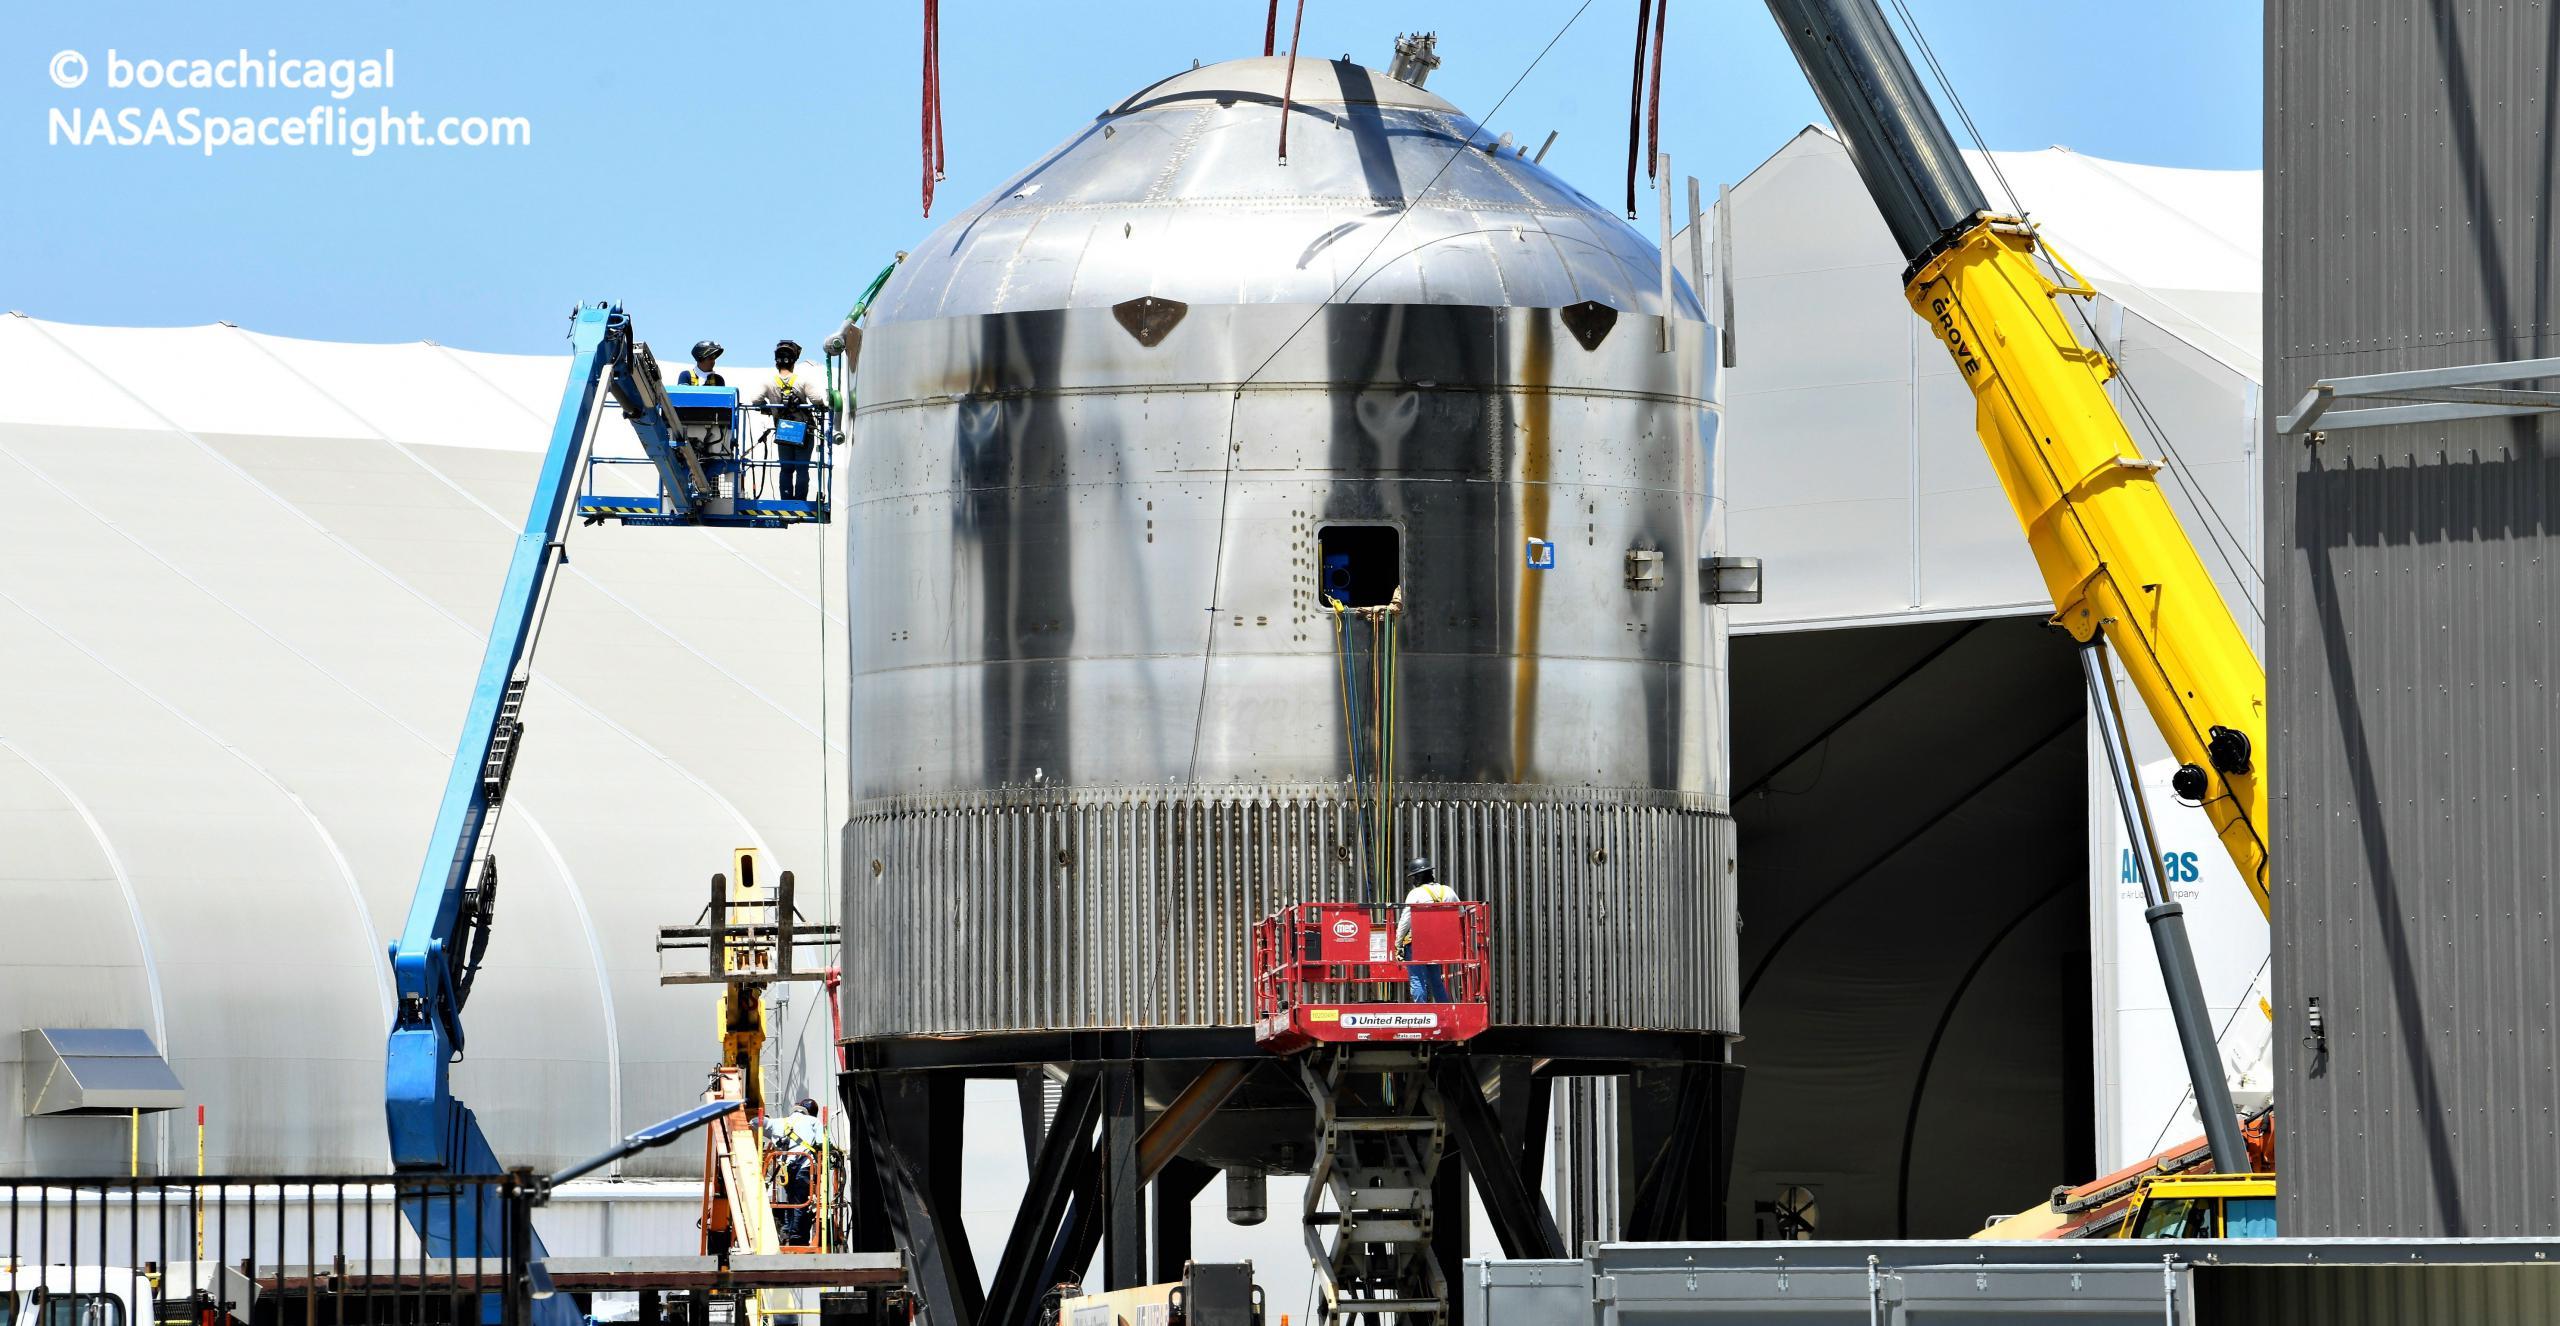 Starship Boca Chica 082021 (NASASpaceflight – bocachicagal) GSE4 mini tank 4 crop (c)